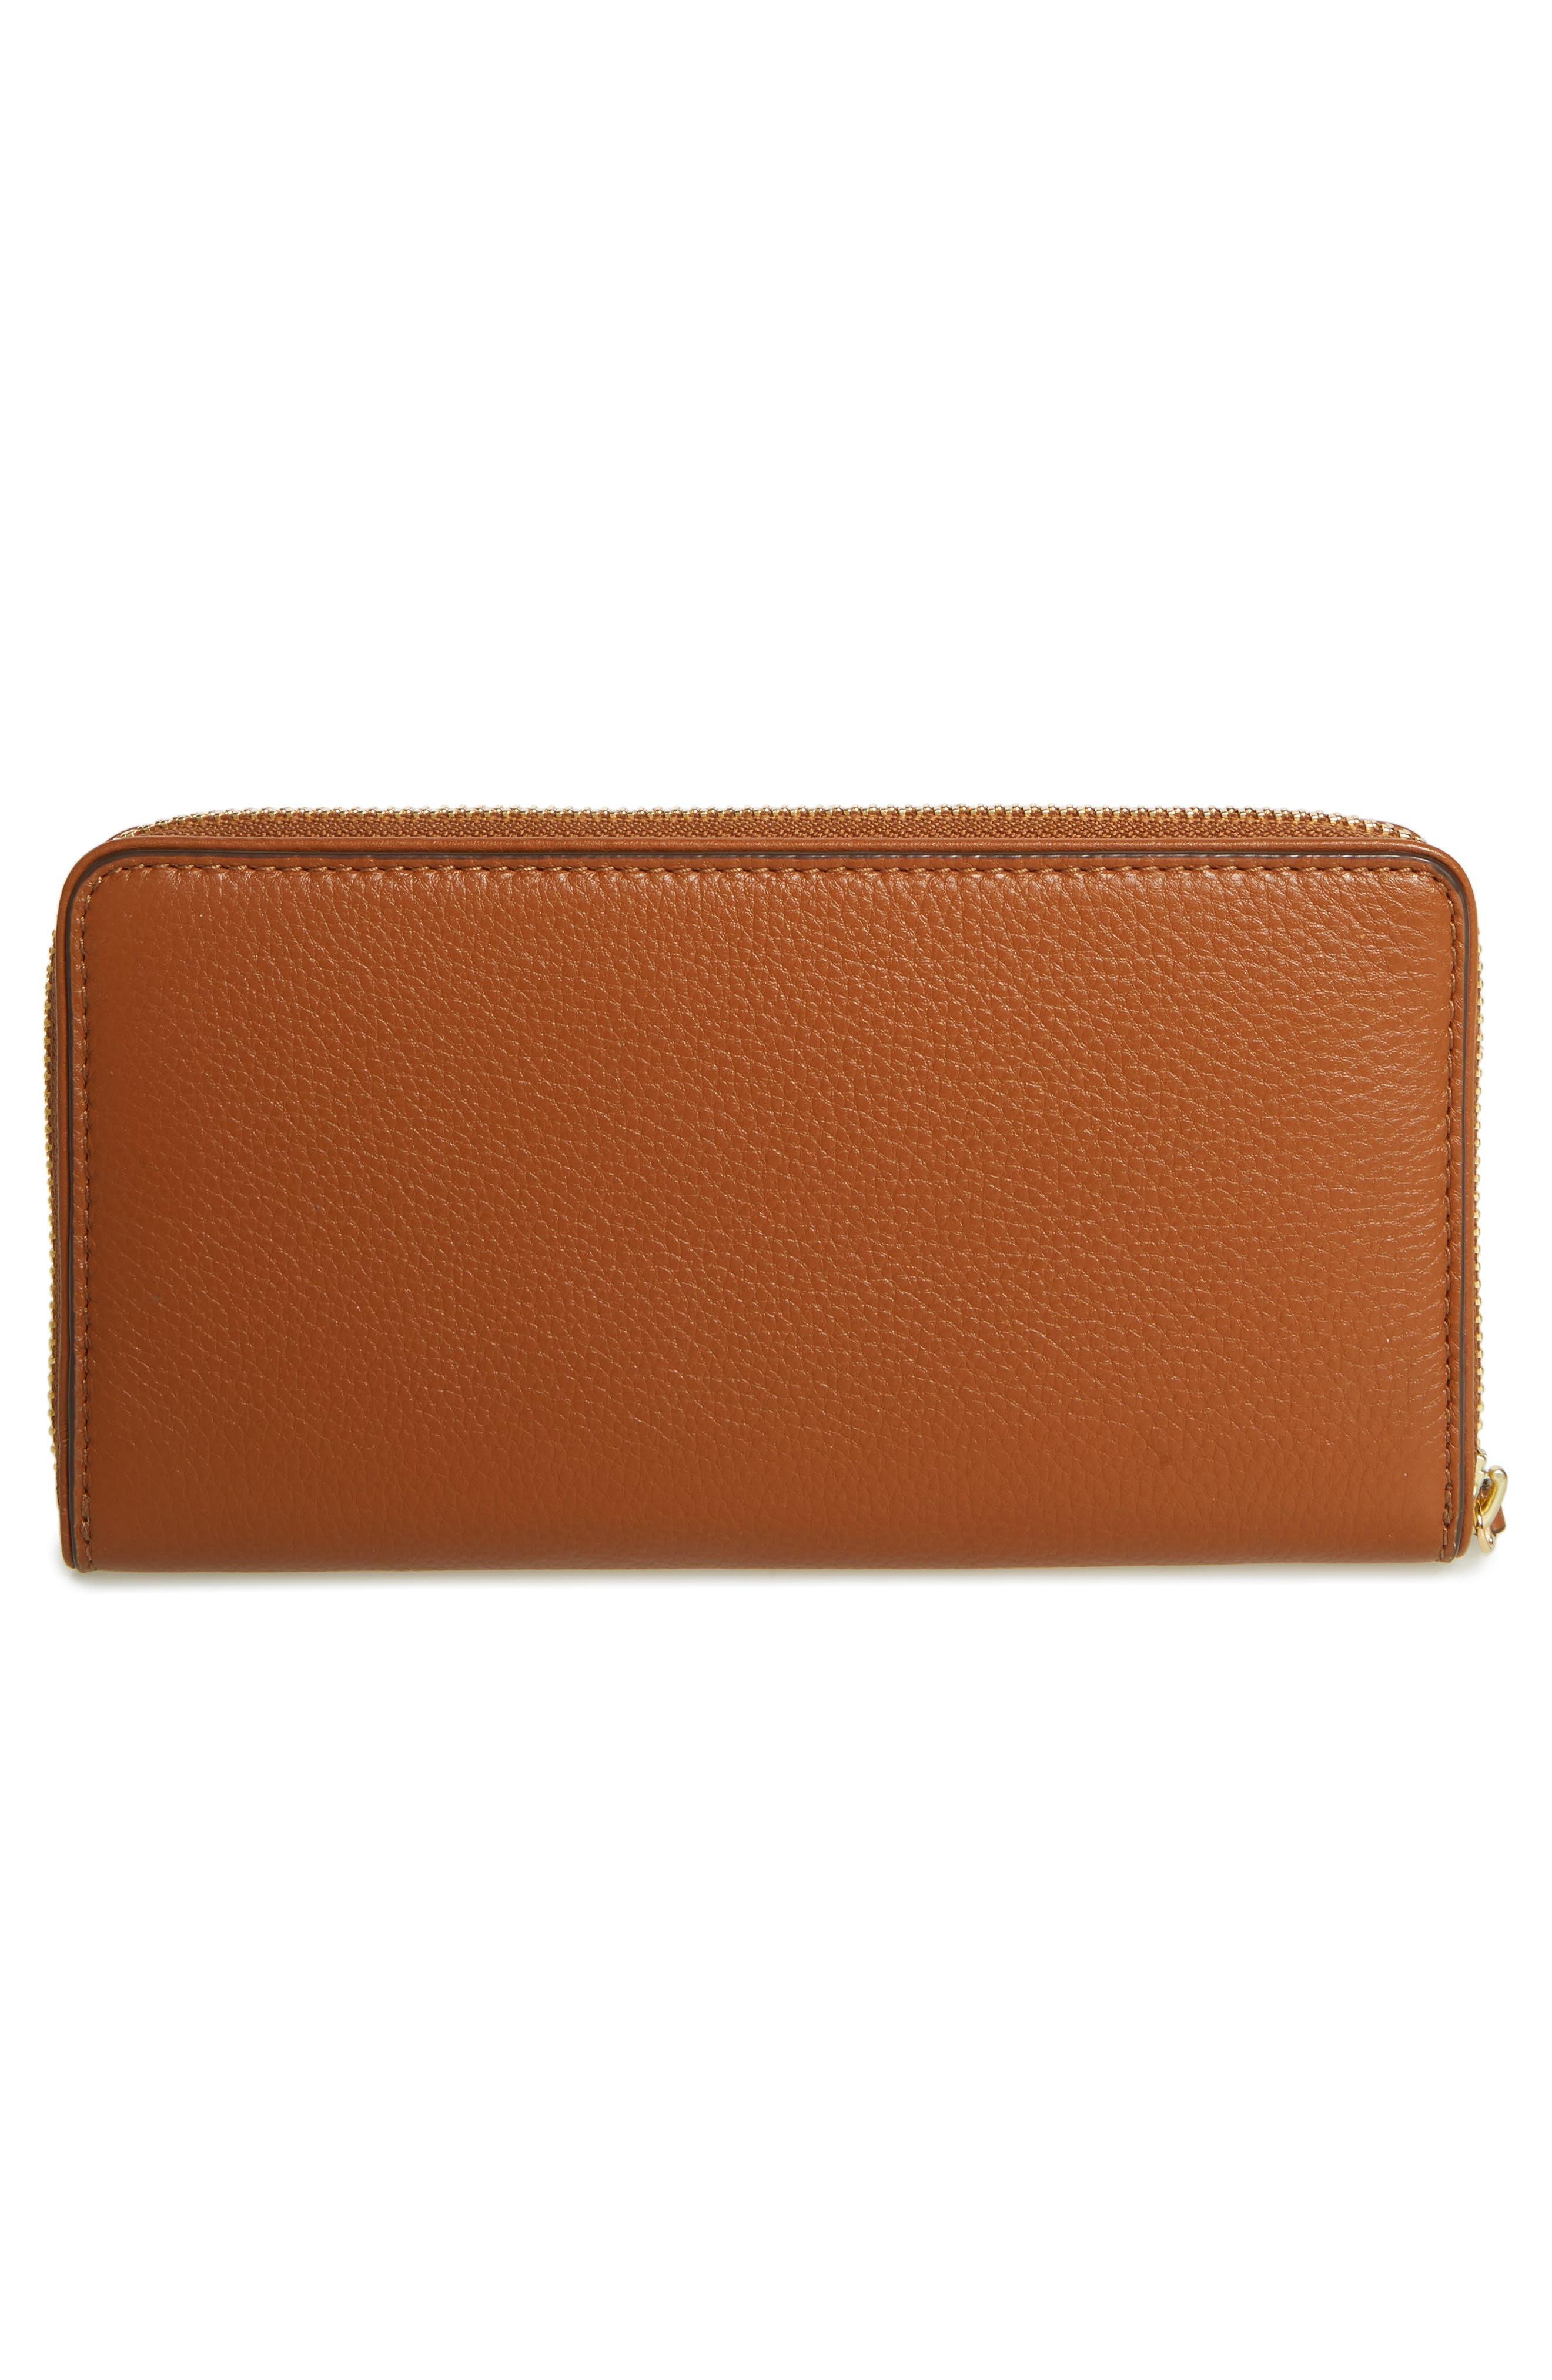 Marsden Leather Zip Around Wallet,                             Alternate thumbnail 8, color,